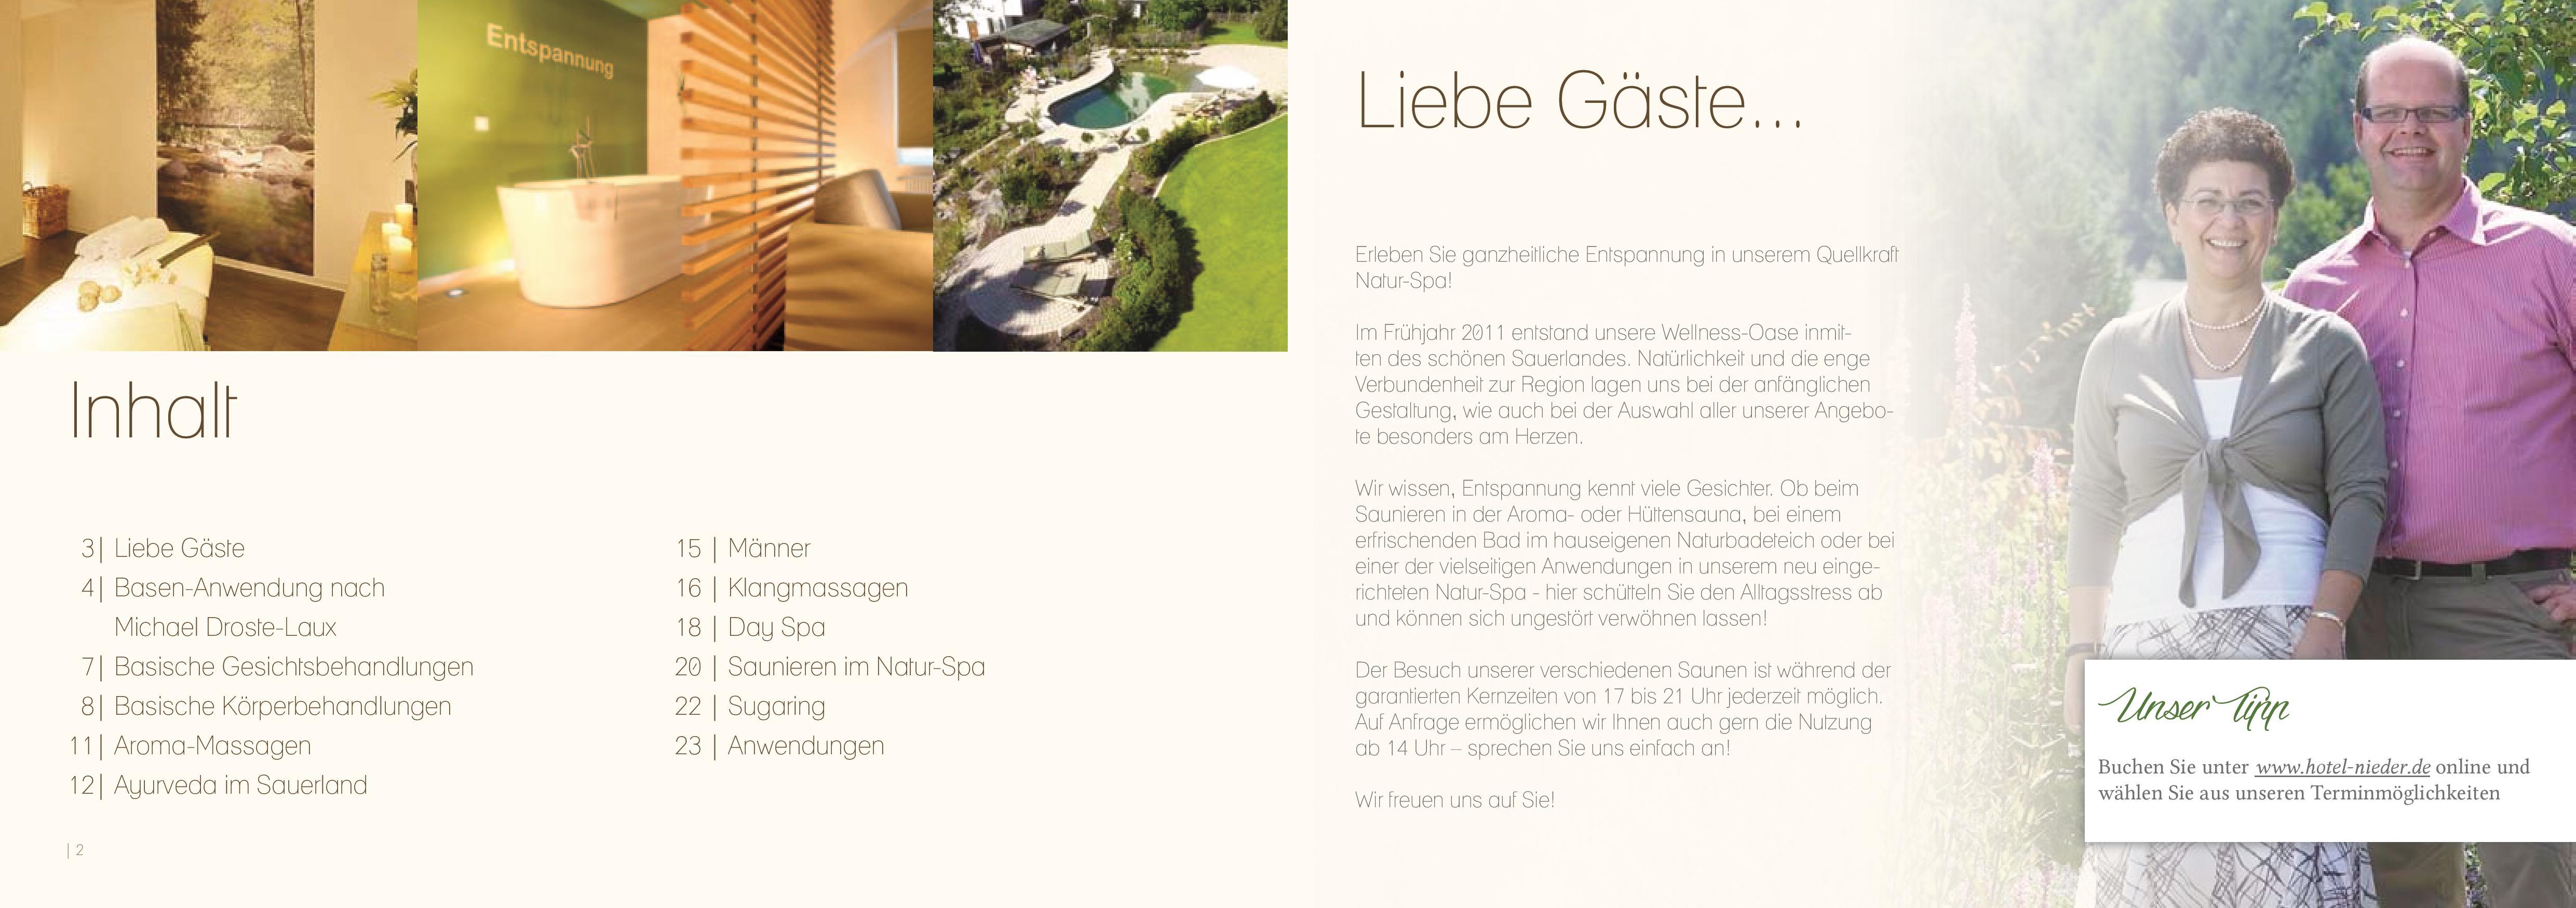 Awesome Massage Broschüre Motif - FORTSETZUNG ARBEITSBLATT ...